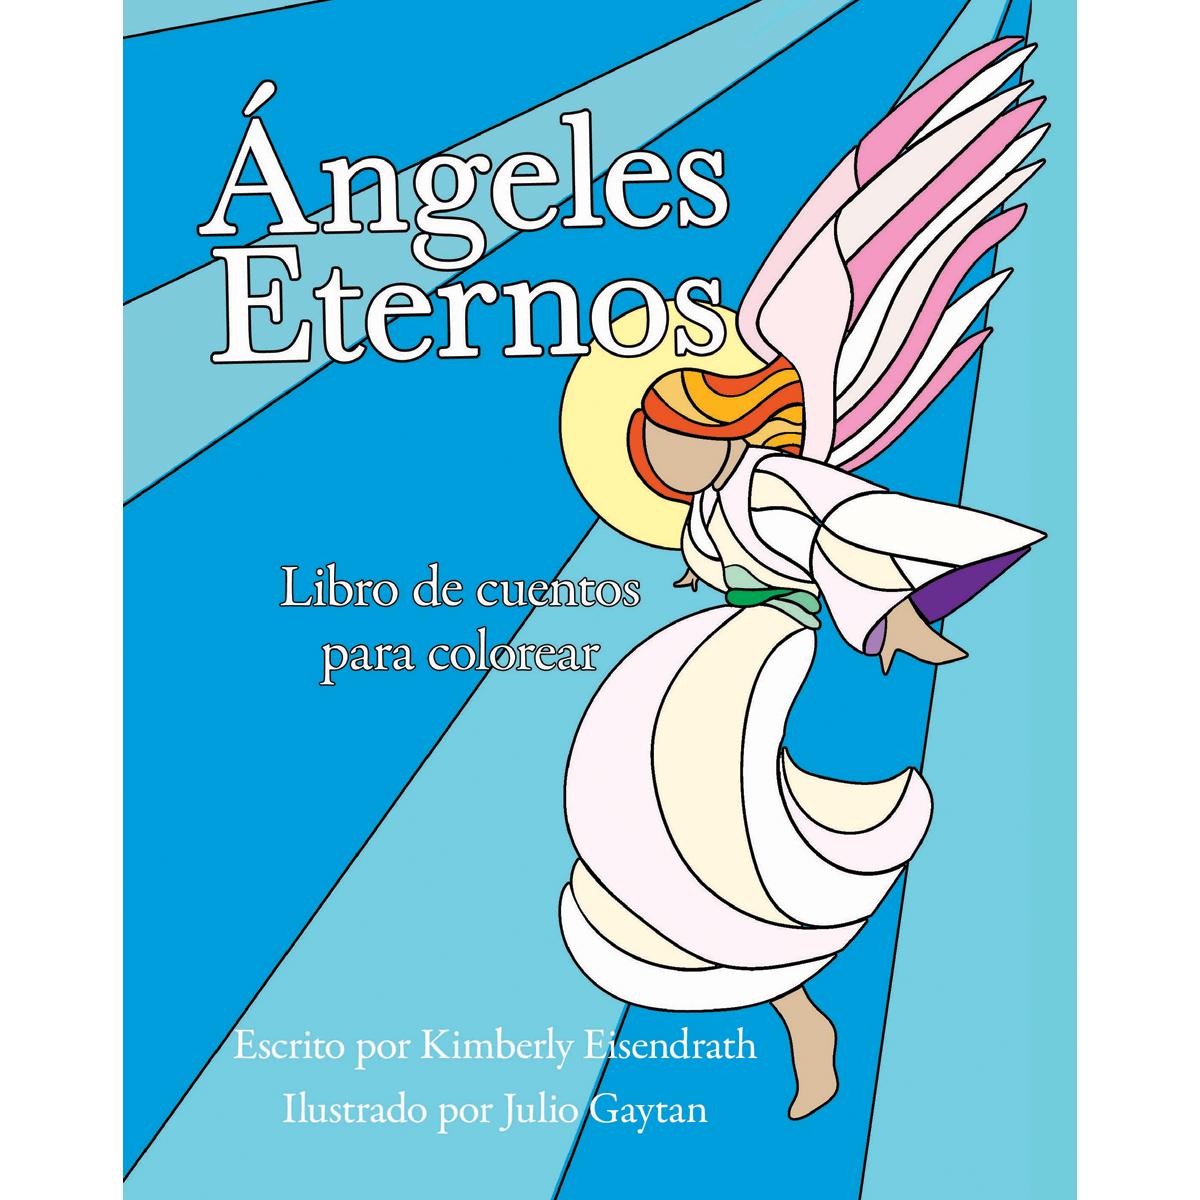 Ángeles Eternos Escrito por Kimberly Eisendrath. Published por A Silver Thread Publishing.